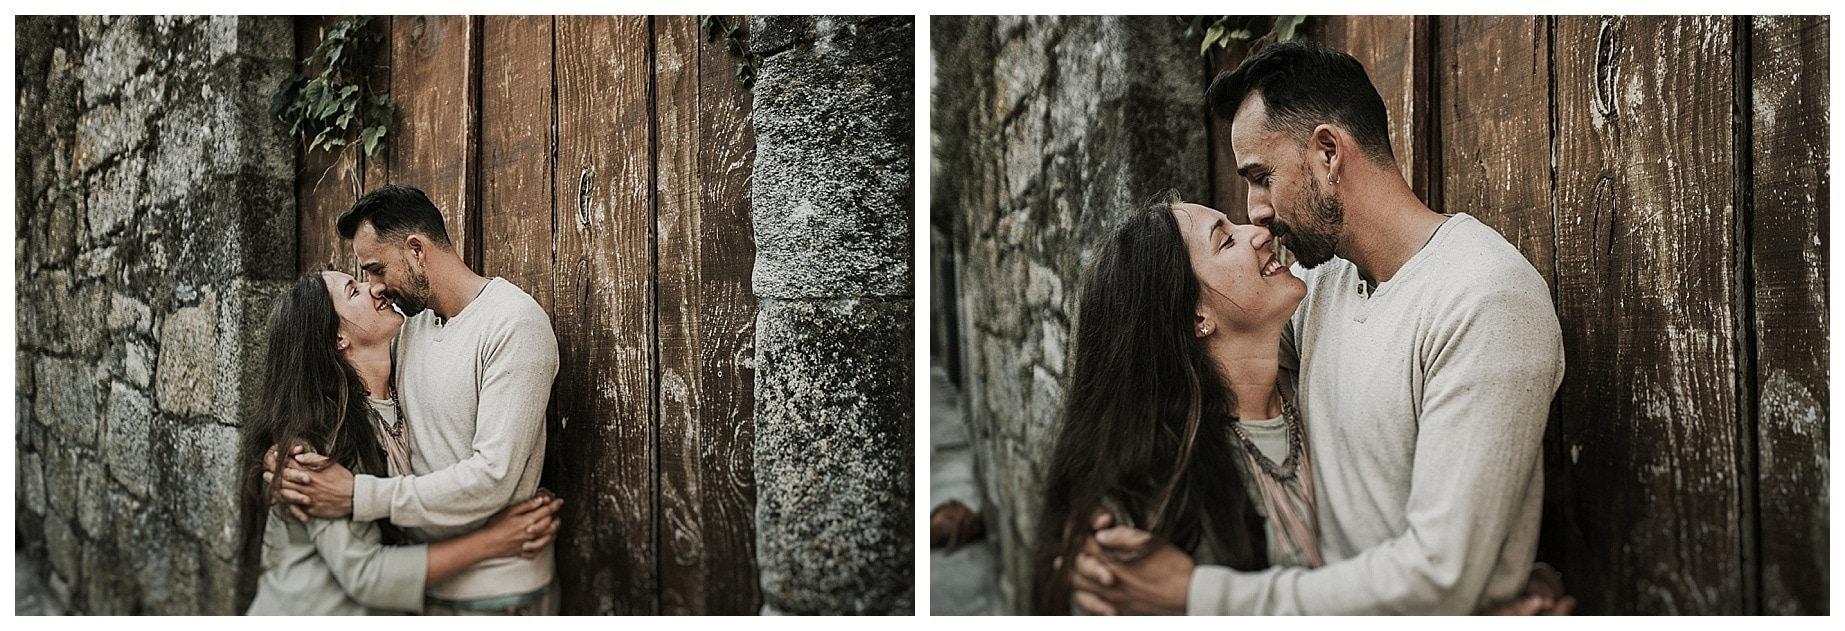 Preboda Vero & Willy · 2º Round - Fotógrafo de Bodas en Pontevedra y Vigo